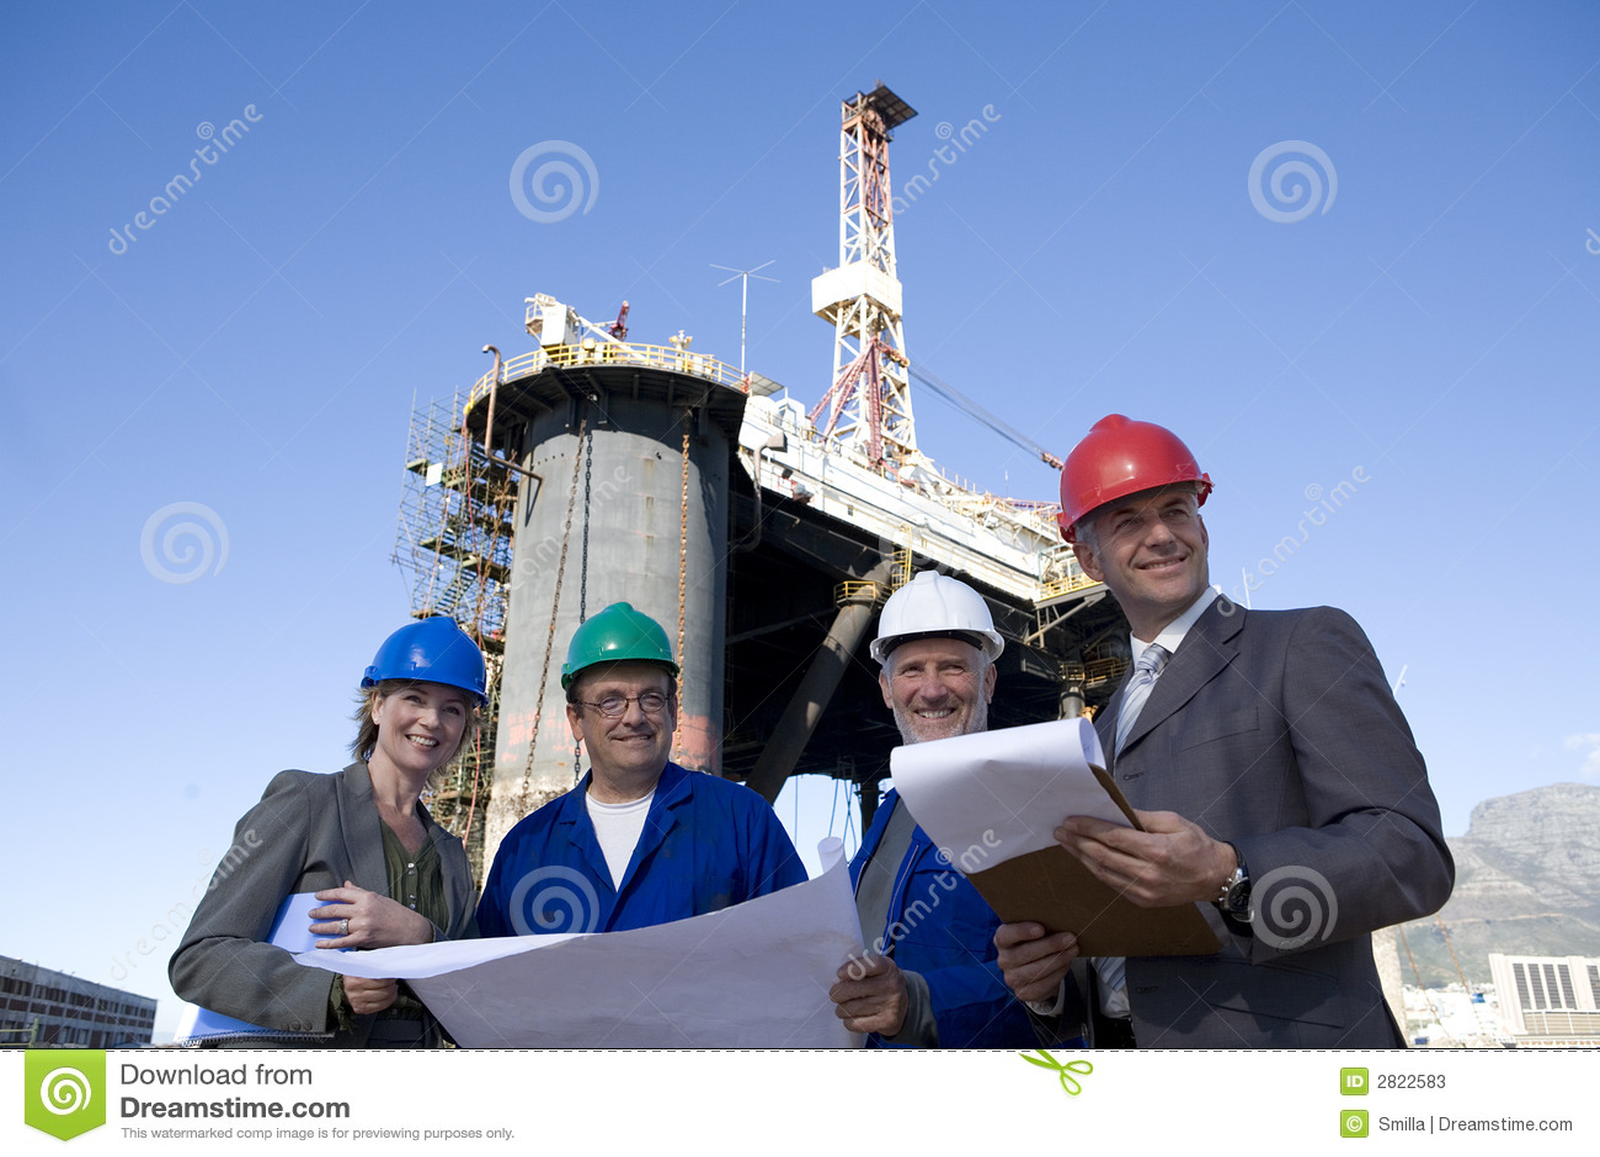 Rig engineer